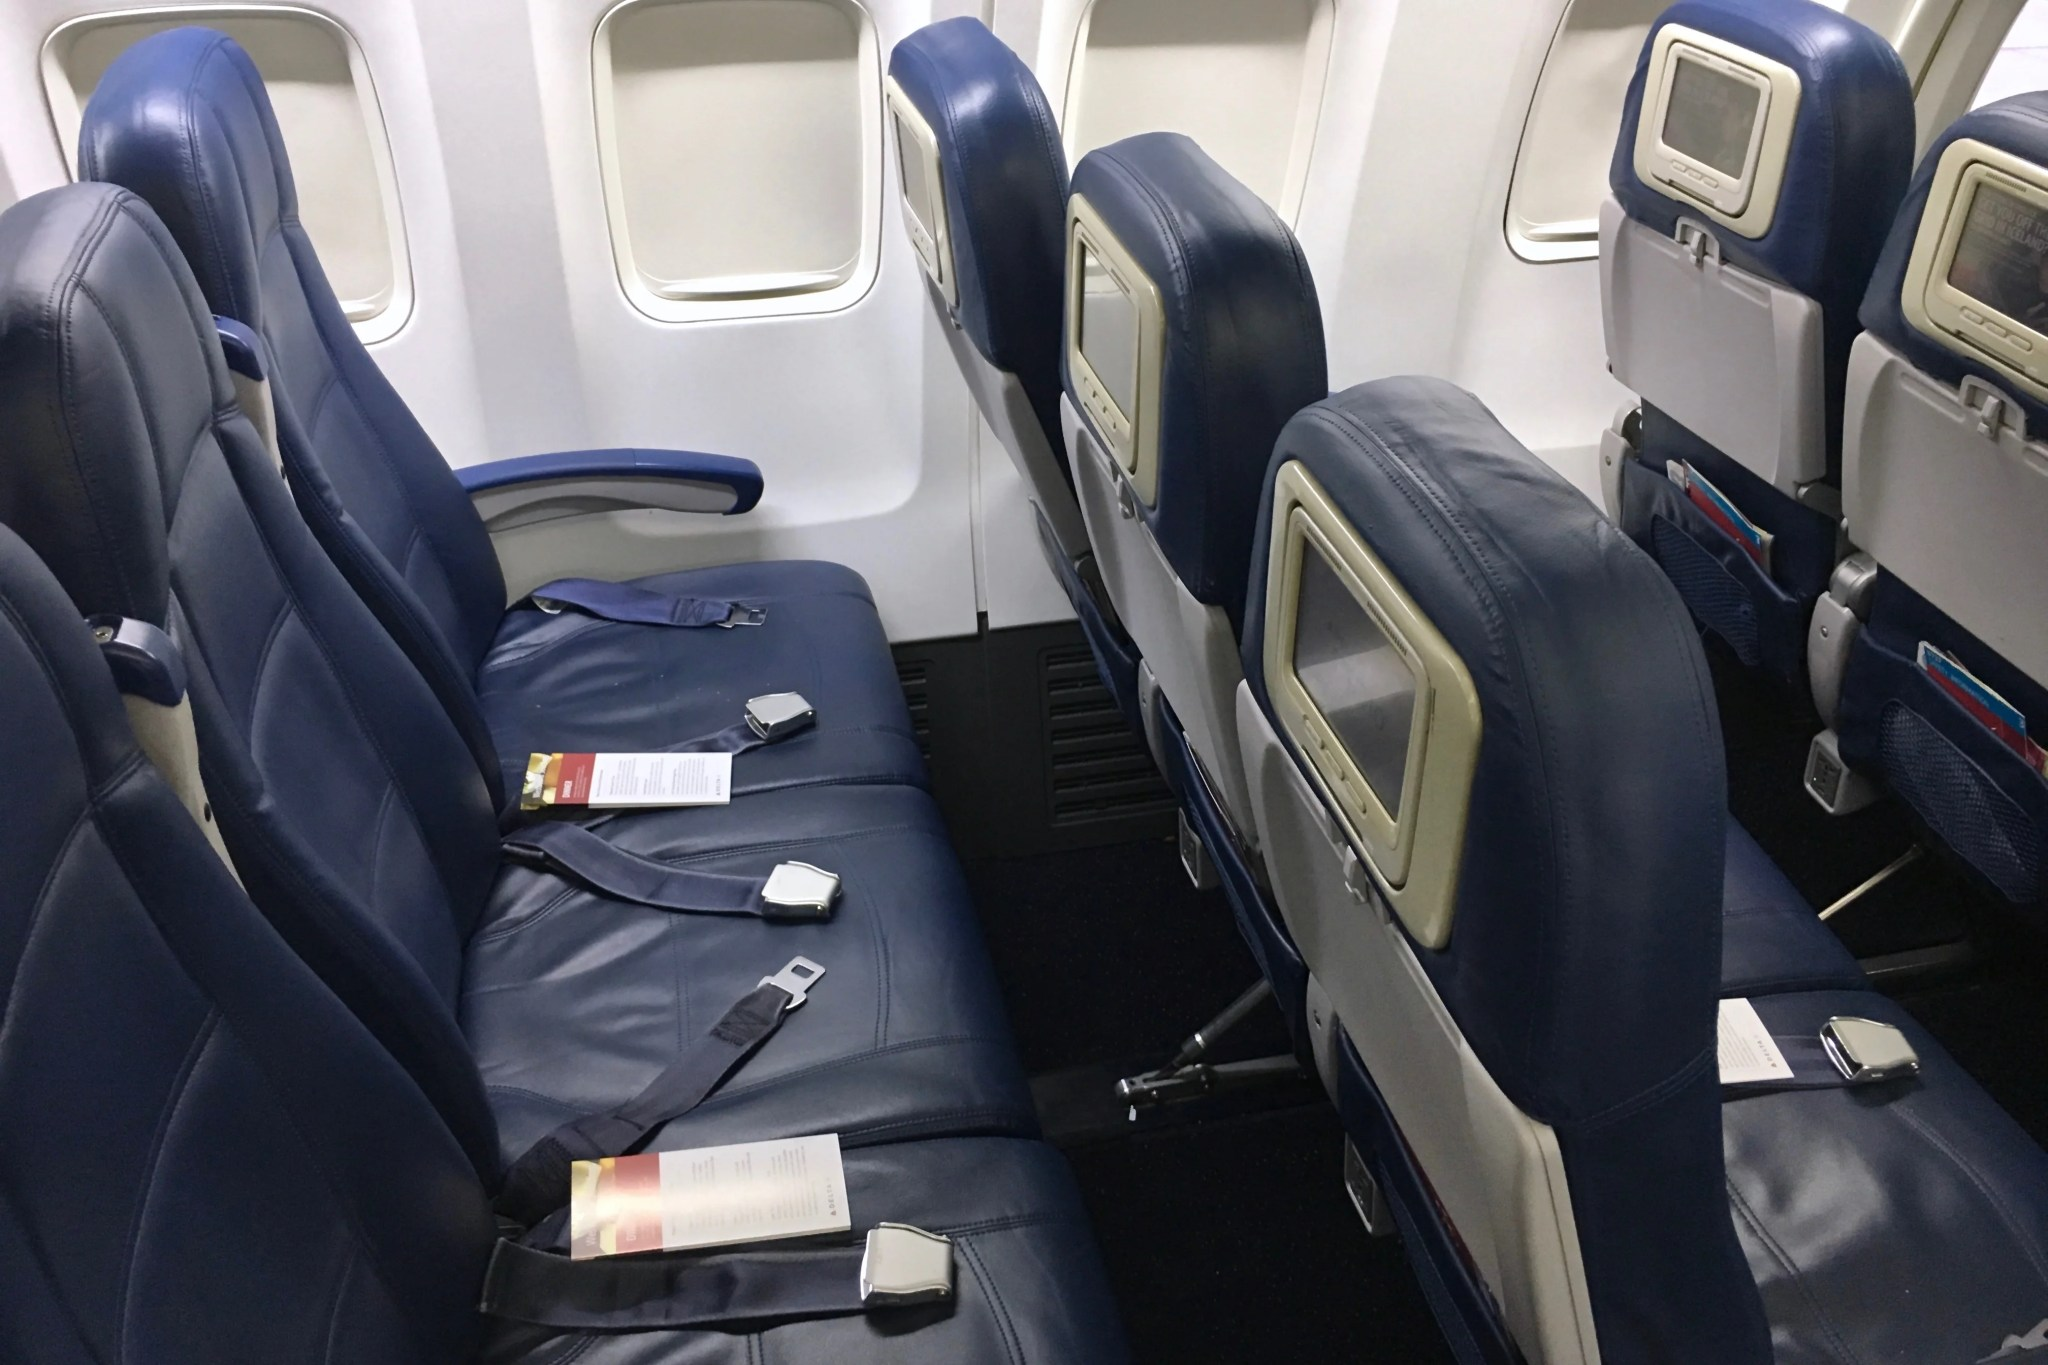 Flight Review: Delta (737-800) Basic Economy, Boston to LA